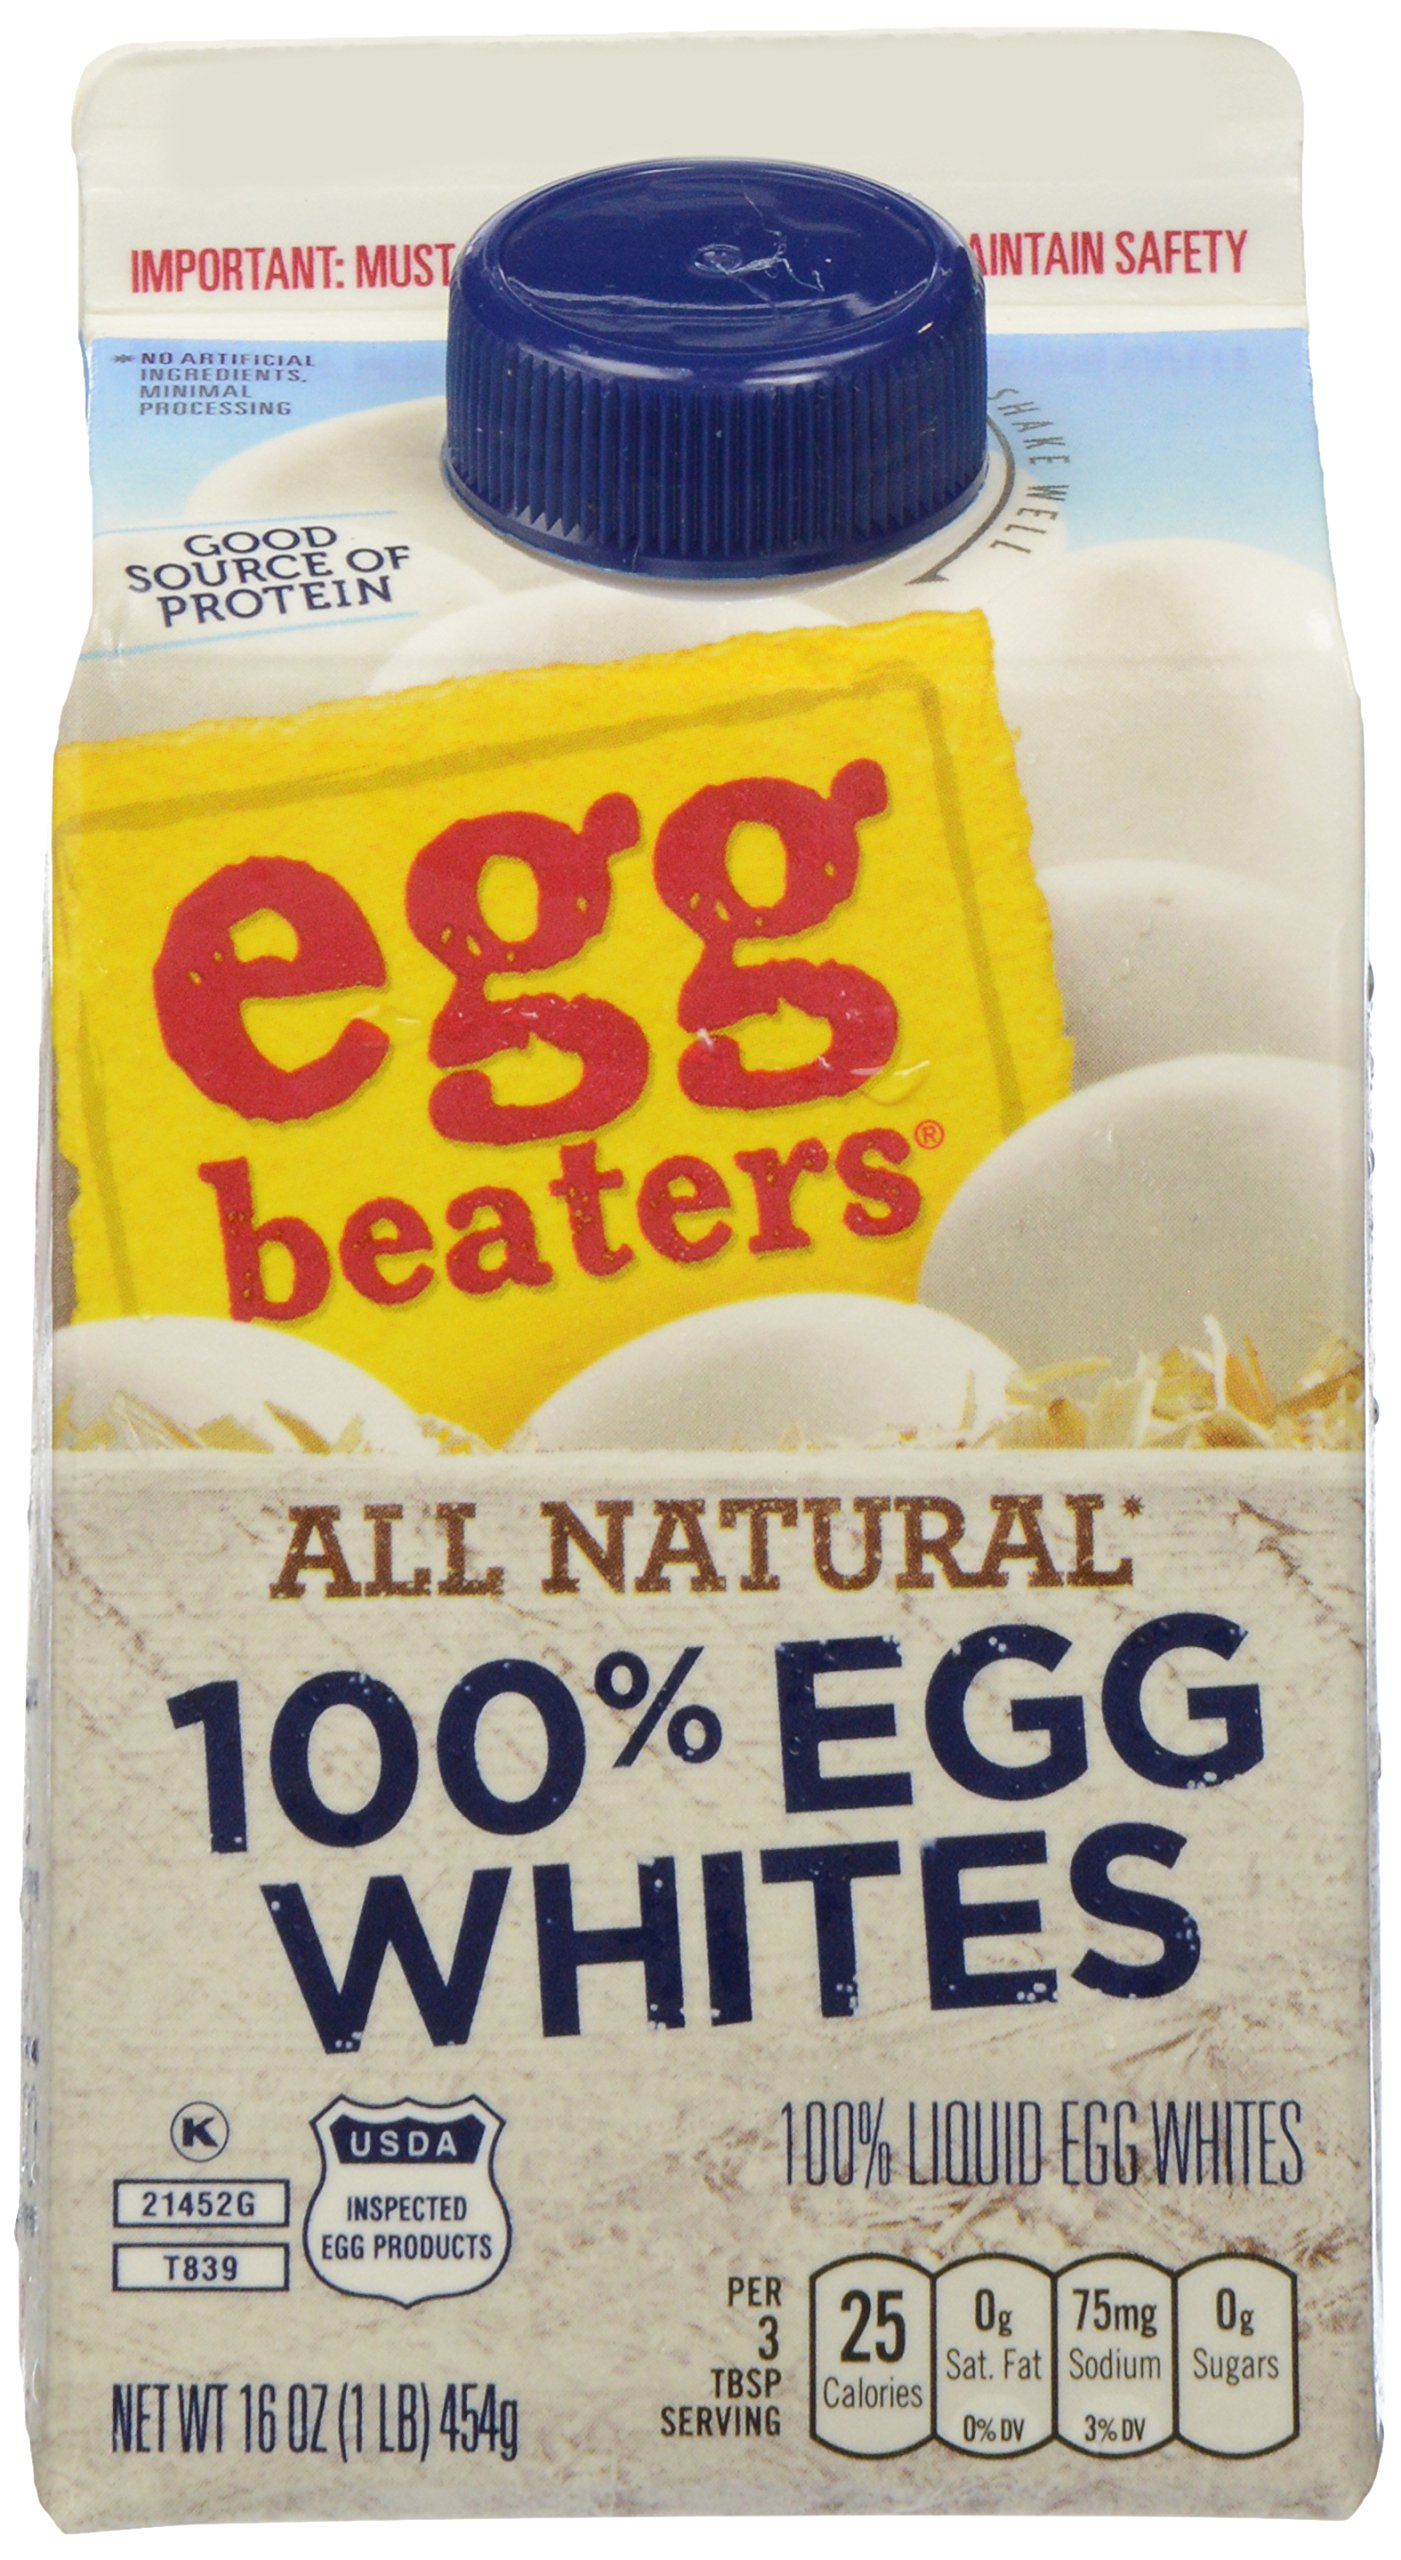 Egg Beaters, Refrigerated Egg Whites, 15 oz